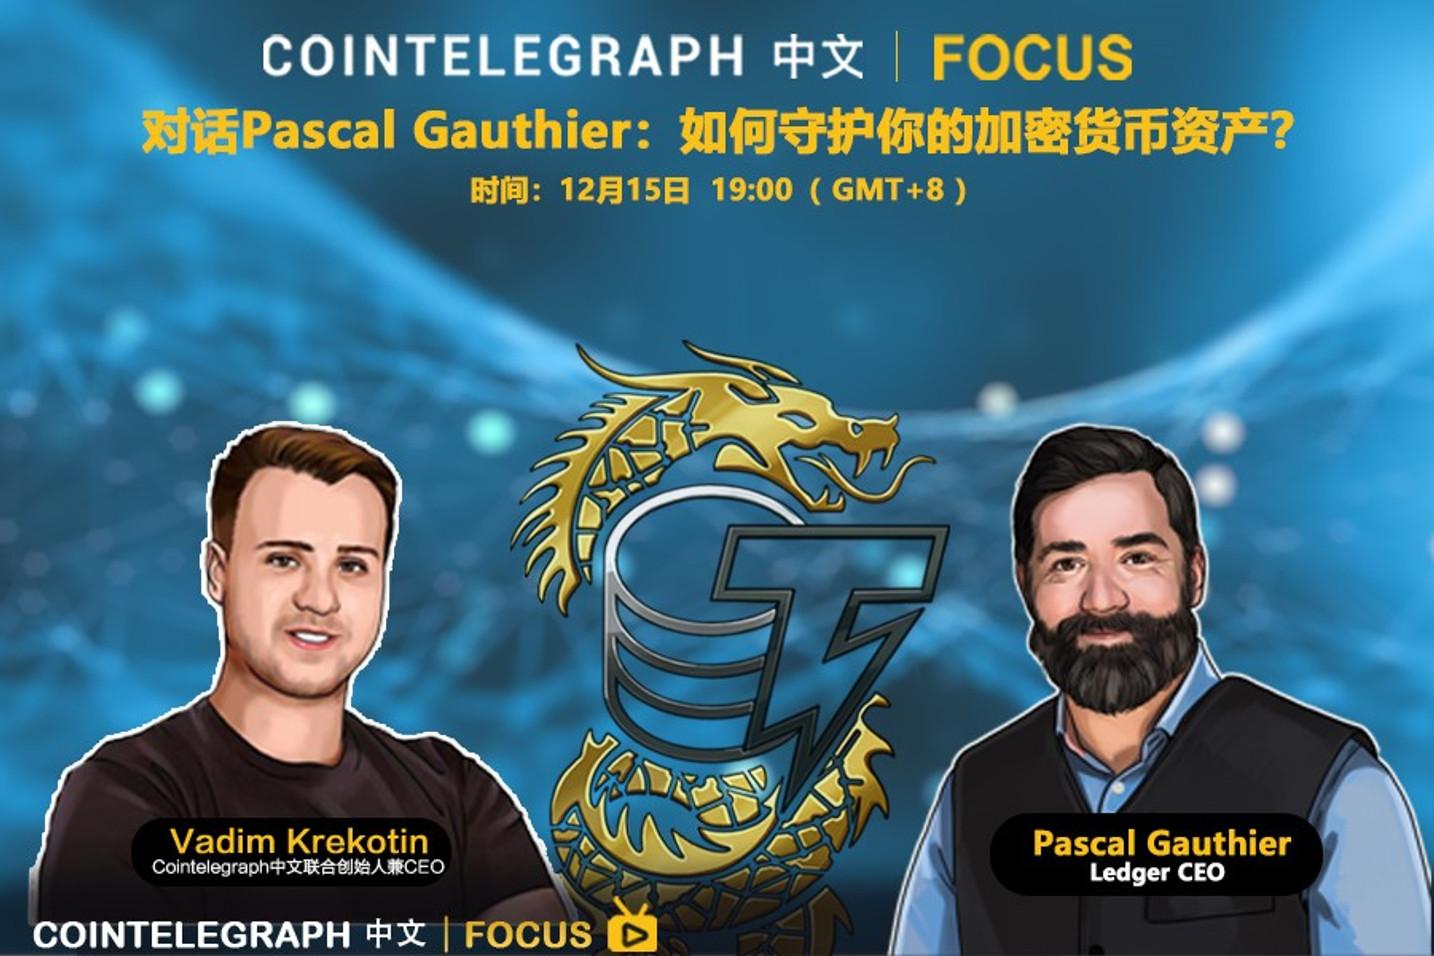 Cointelegraph中文Focus|对话Pascal Gauthier:如何守护你的加密货币